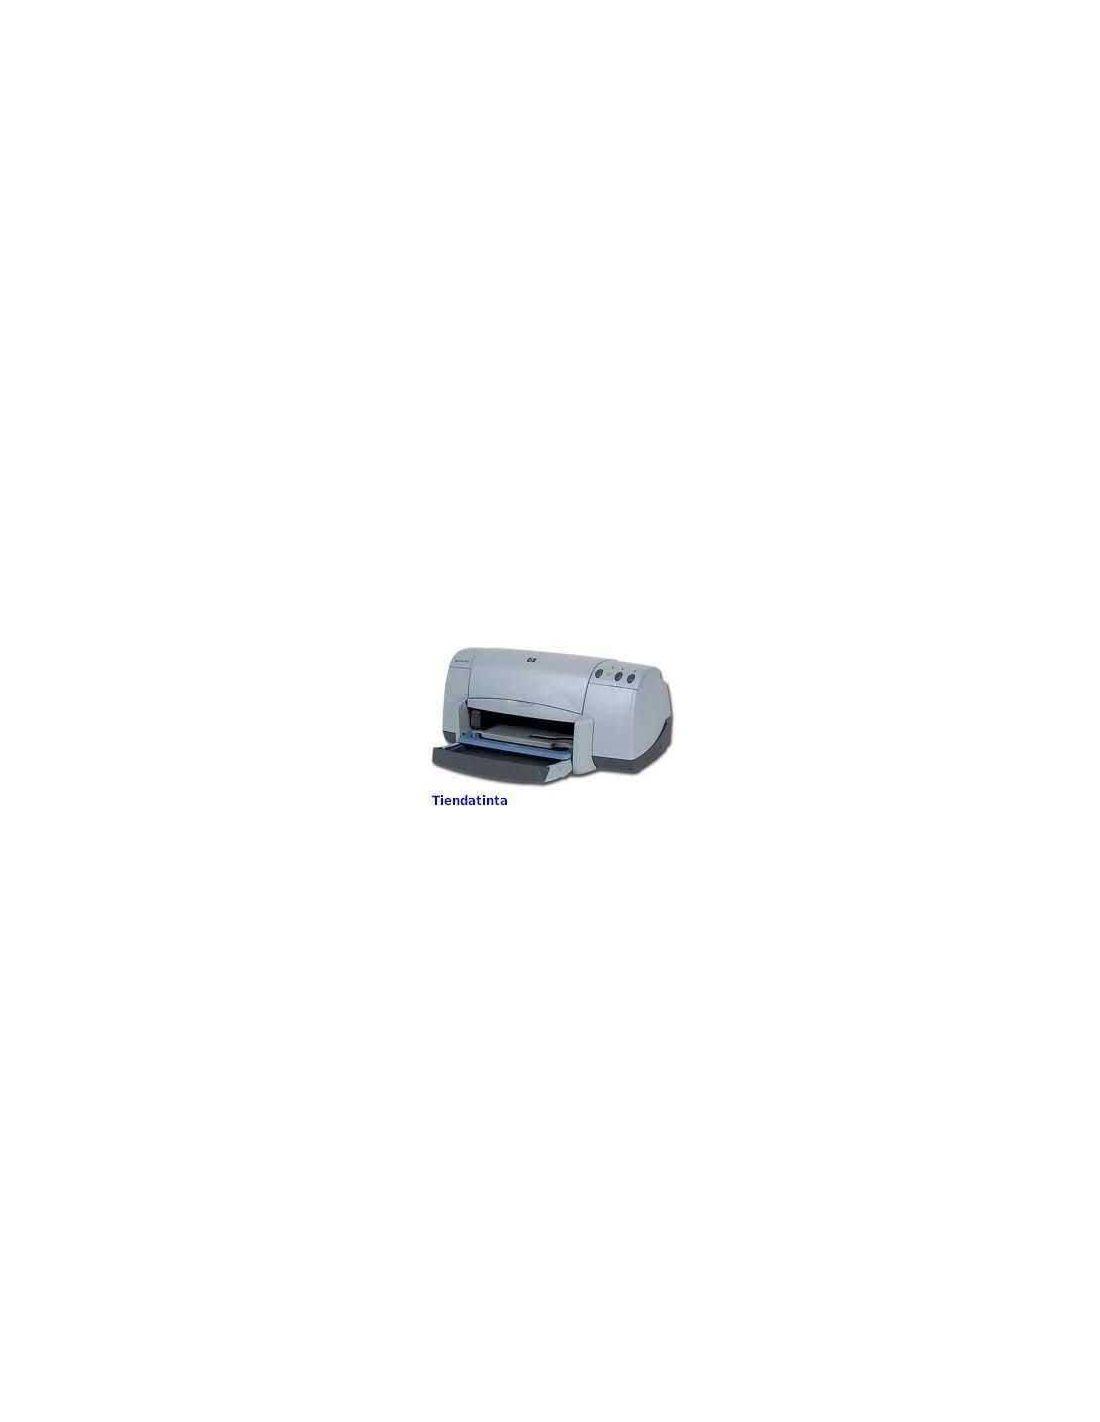 descargar driver impresora hp deskjet 2135 gratis